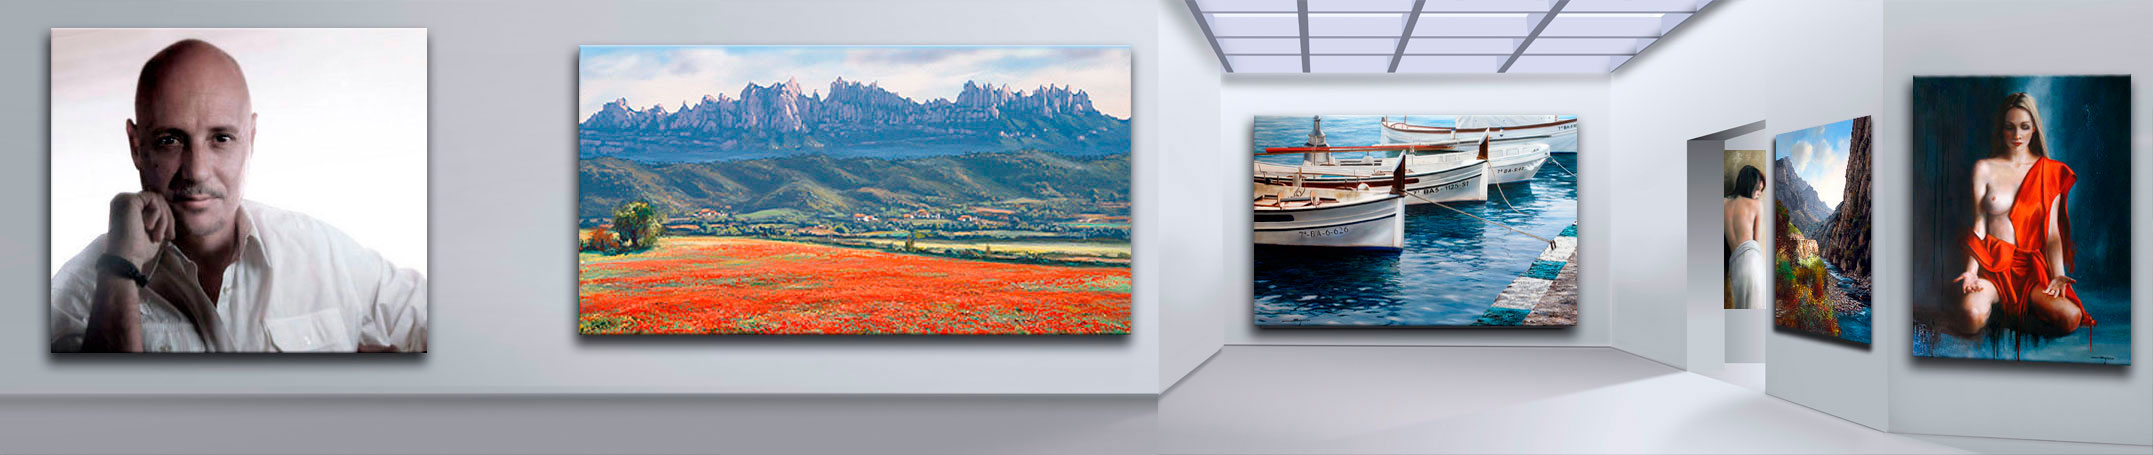 Jordi Sugrañes Artista Pintor